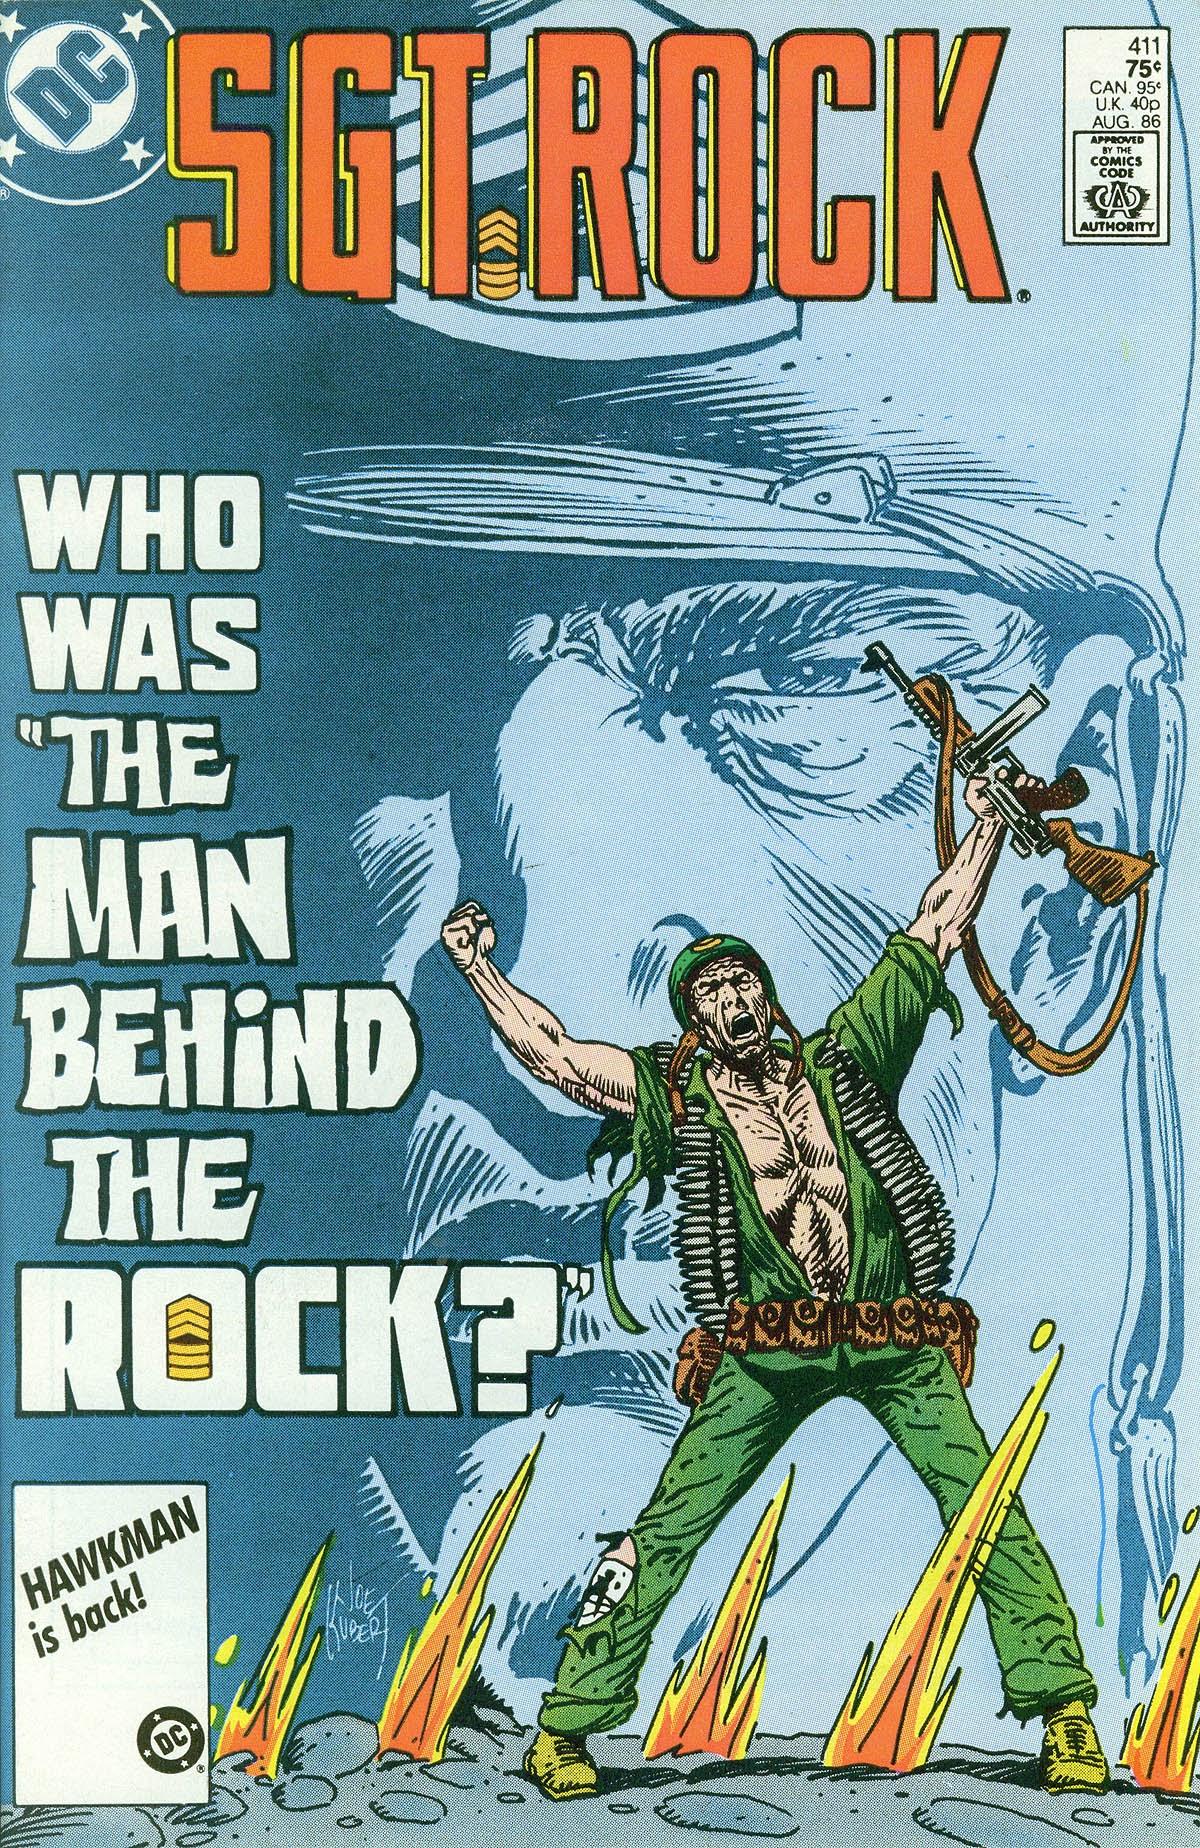 Read online Sgt. Rock comic -  Issue #411 - 1